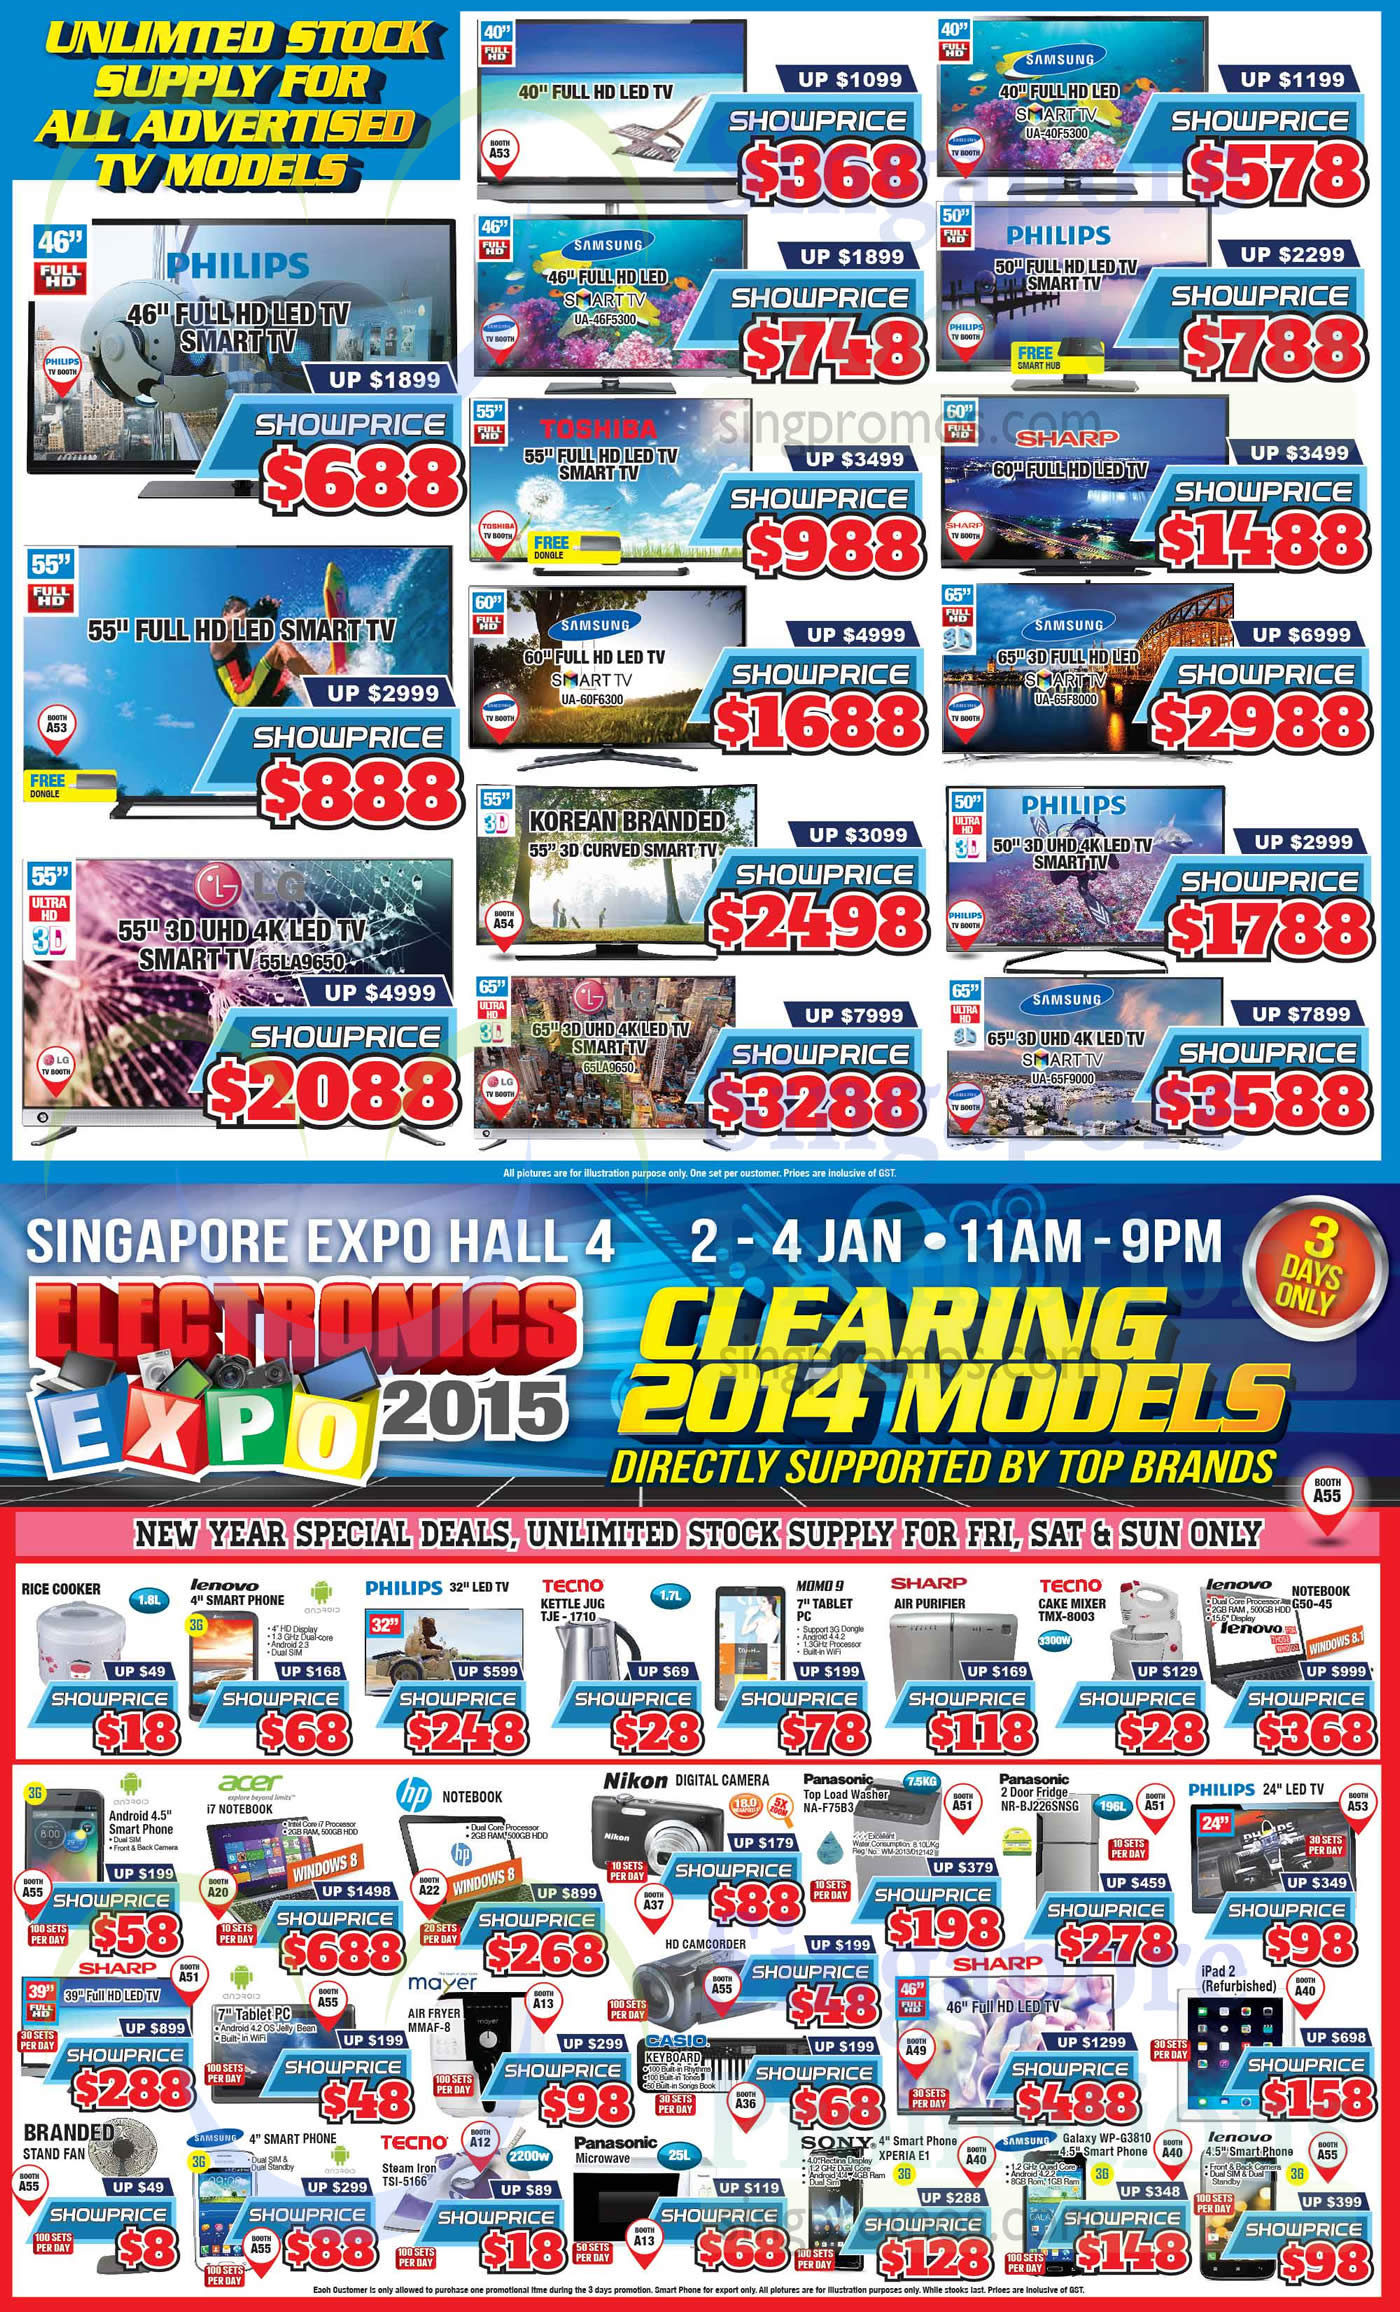 Samsung UA46F5300 TV, Samsung UA40F5300 TV, SamsungUS65F8000 TV, Samsung UA60F6300 TV, LG 55LA9650 TV, LG 65LA9650 TV, Samsung UA65F9000 TV, Lenovo G50-45 Notebook, Tecno TMX-8003 Cake Mixer, Tecno TJE-1710 Kettle Jug, Panasonic NA-F75B3 Washer, Panasonic NR-BJ226SNSG Fridge, Mayer MMAF-8 Air Fryer, Tecno TSI-5166 Steam Iron, Sony XPERIA E1 and Samsung Galaxy WP-G3810 Mobile Phone